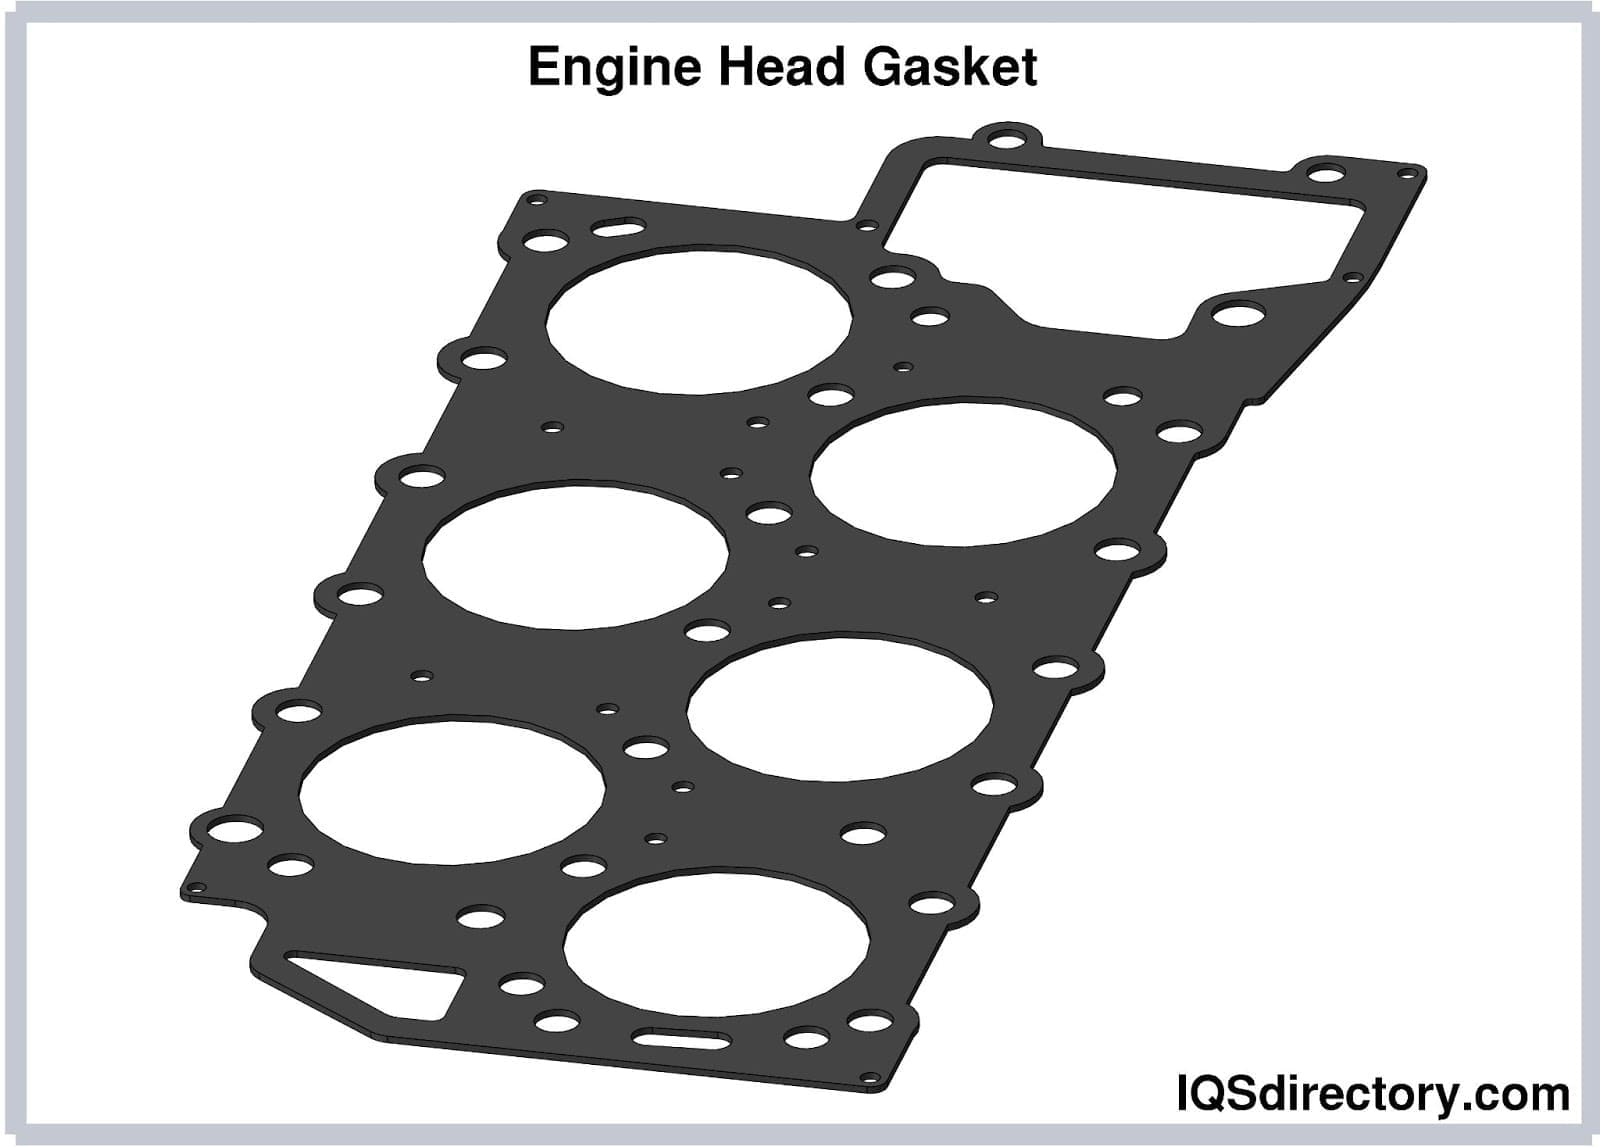 Engine Head Gasket